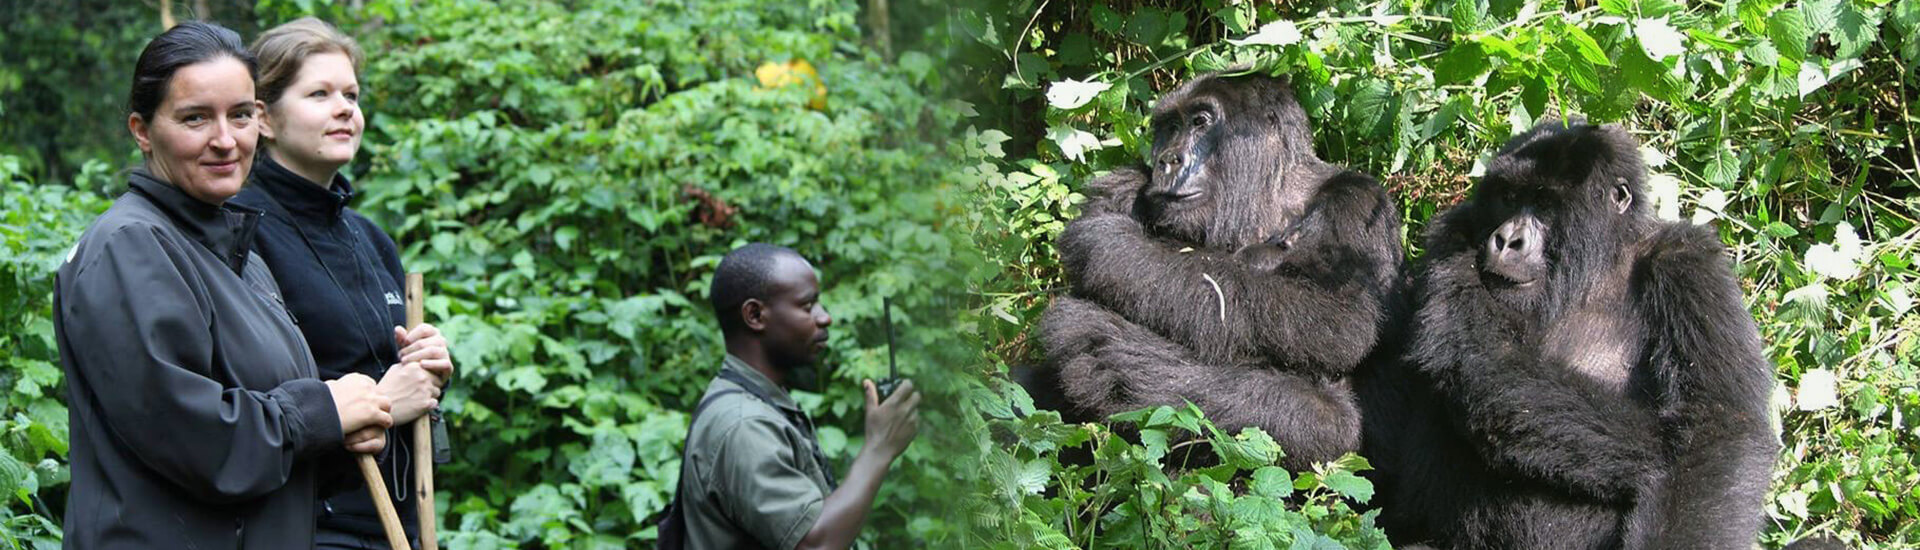 Blog-Gorillatrecking-2